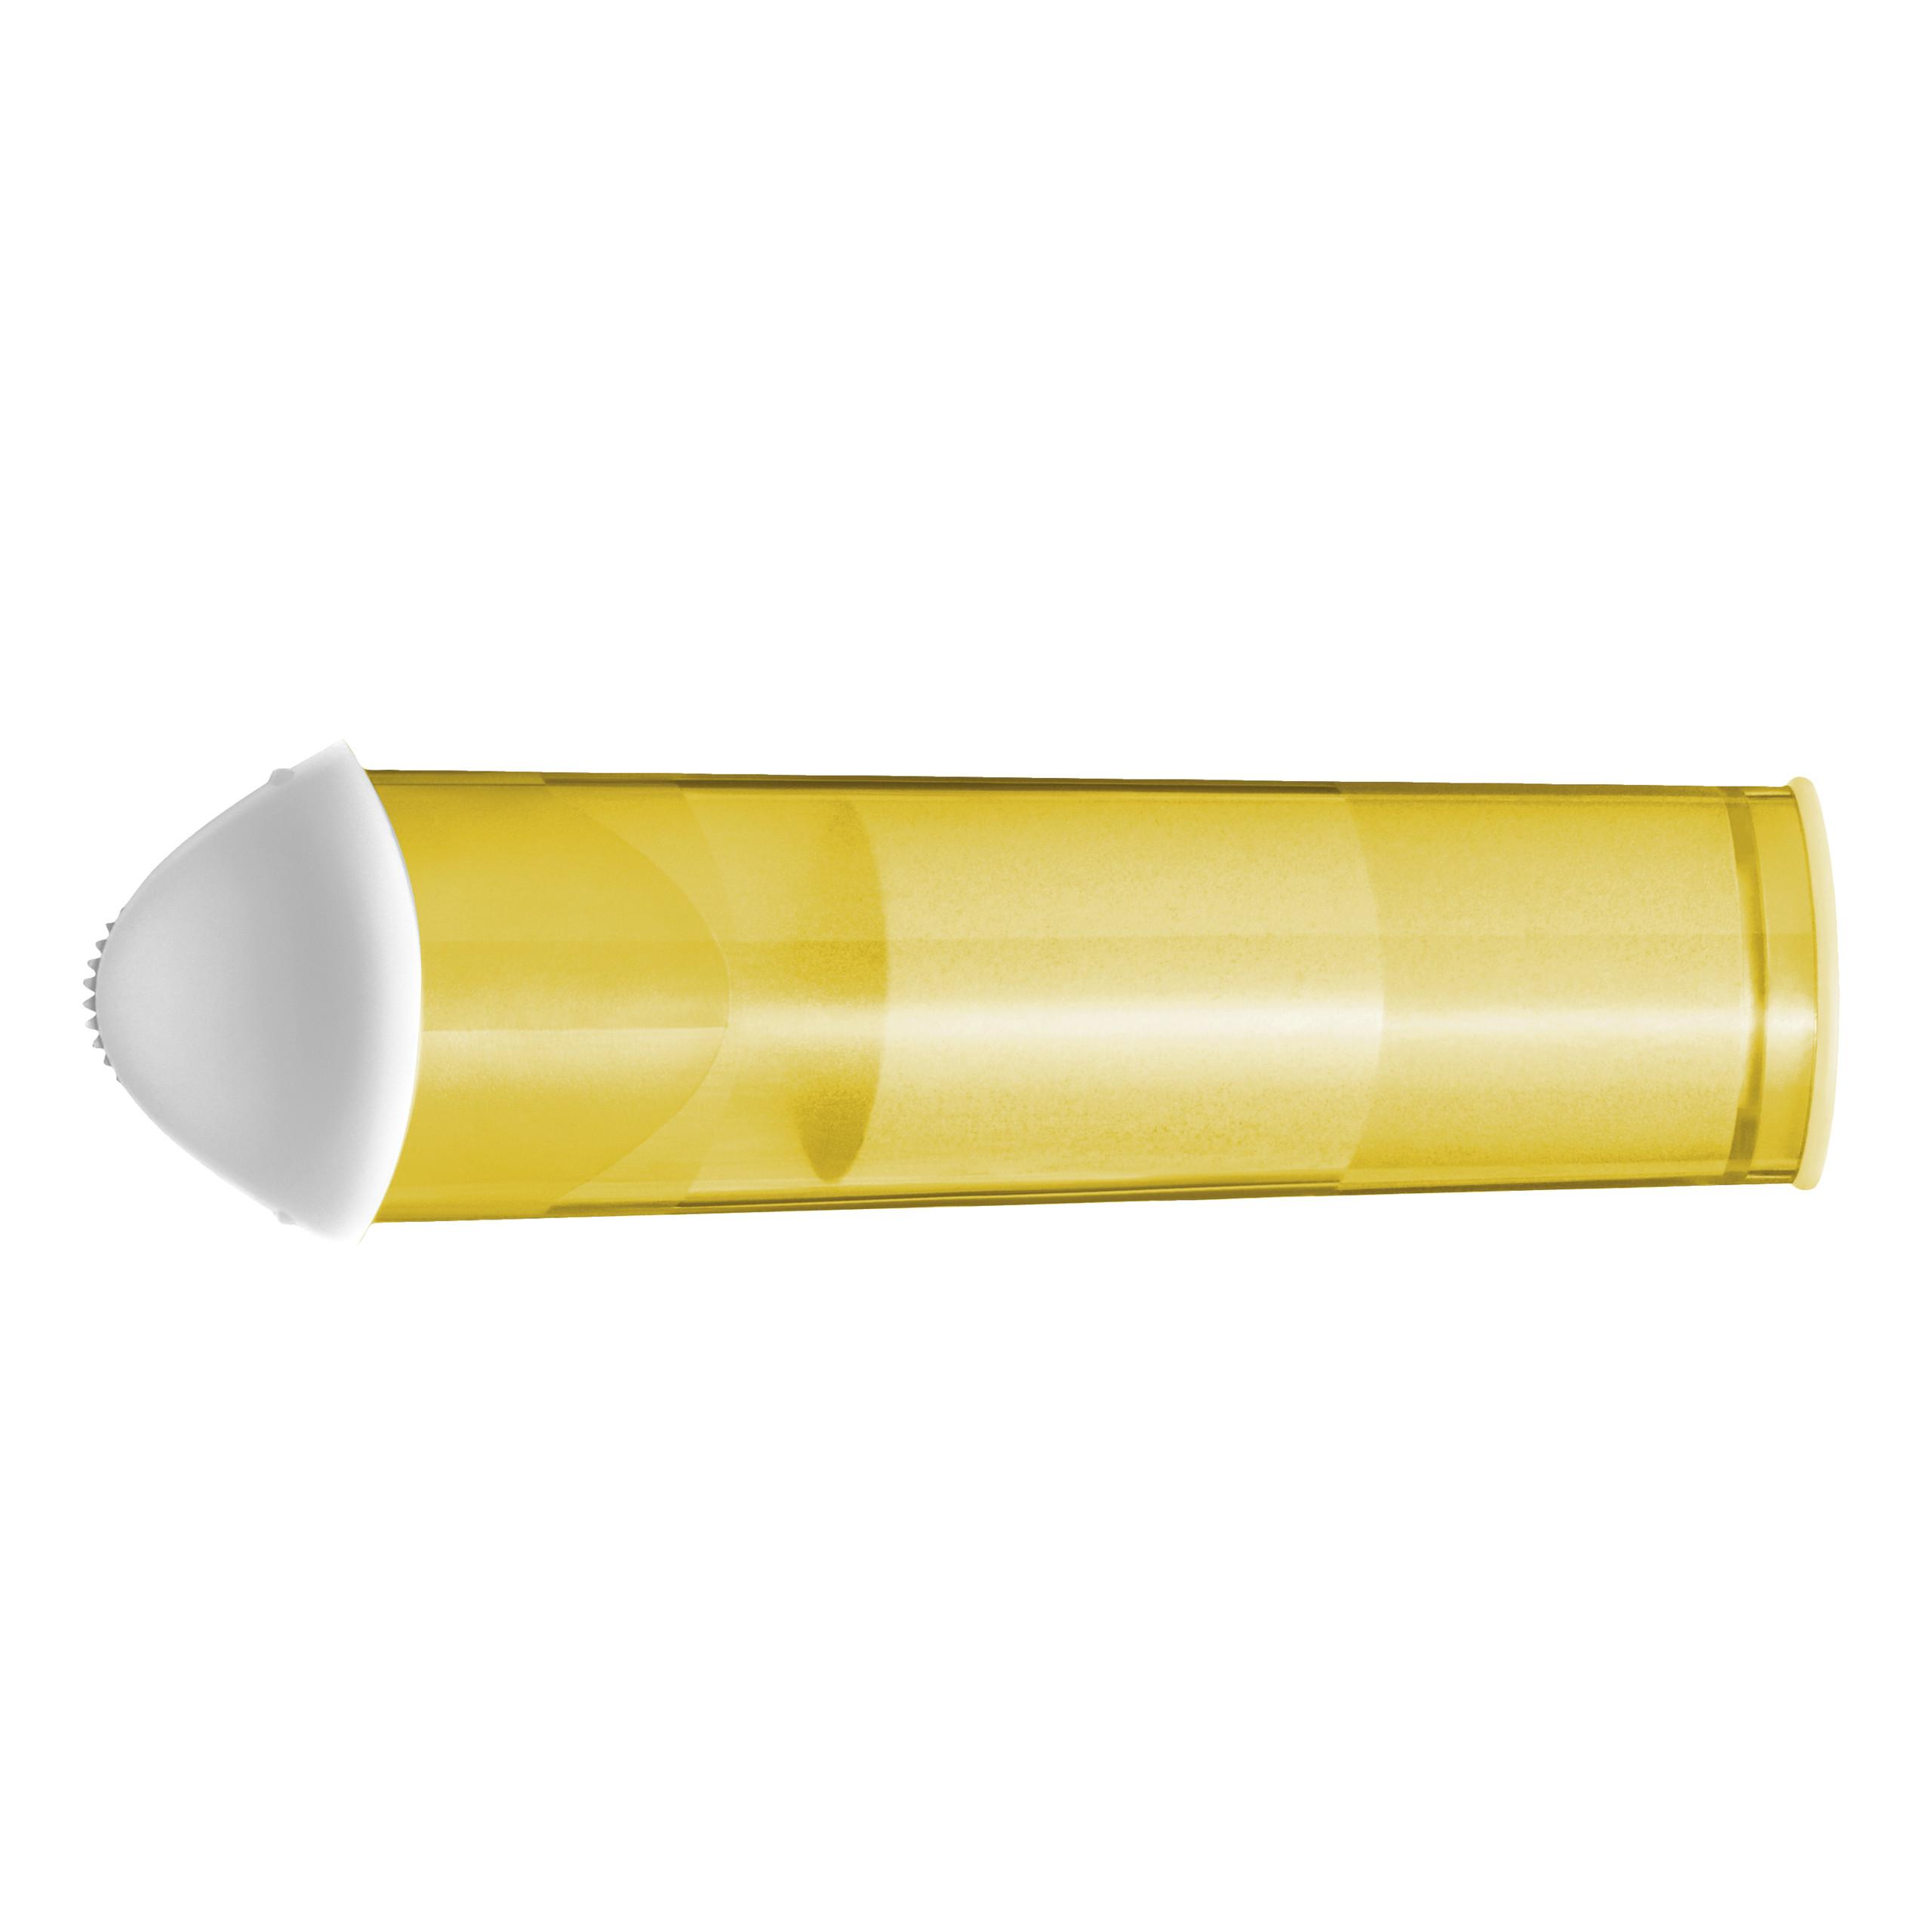 Kreidepatrone gelb, Prym - Art. 610957